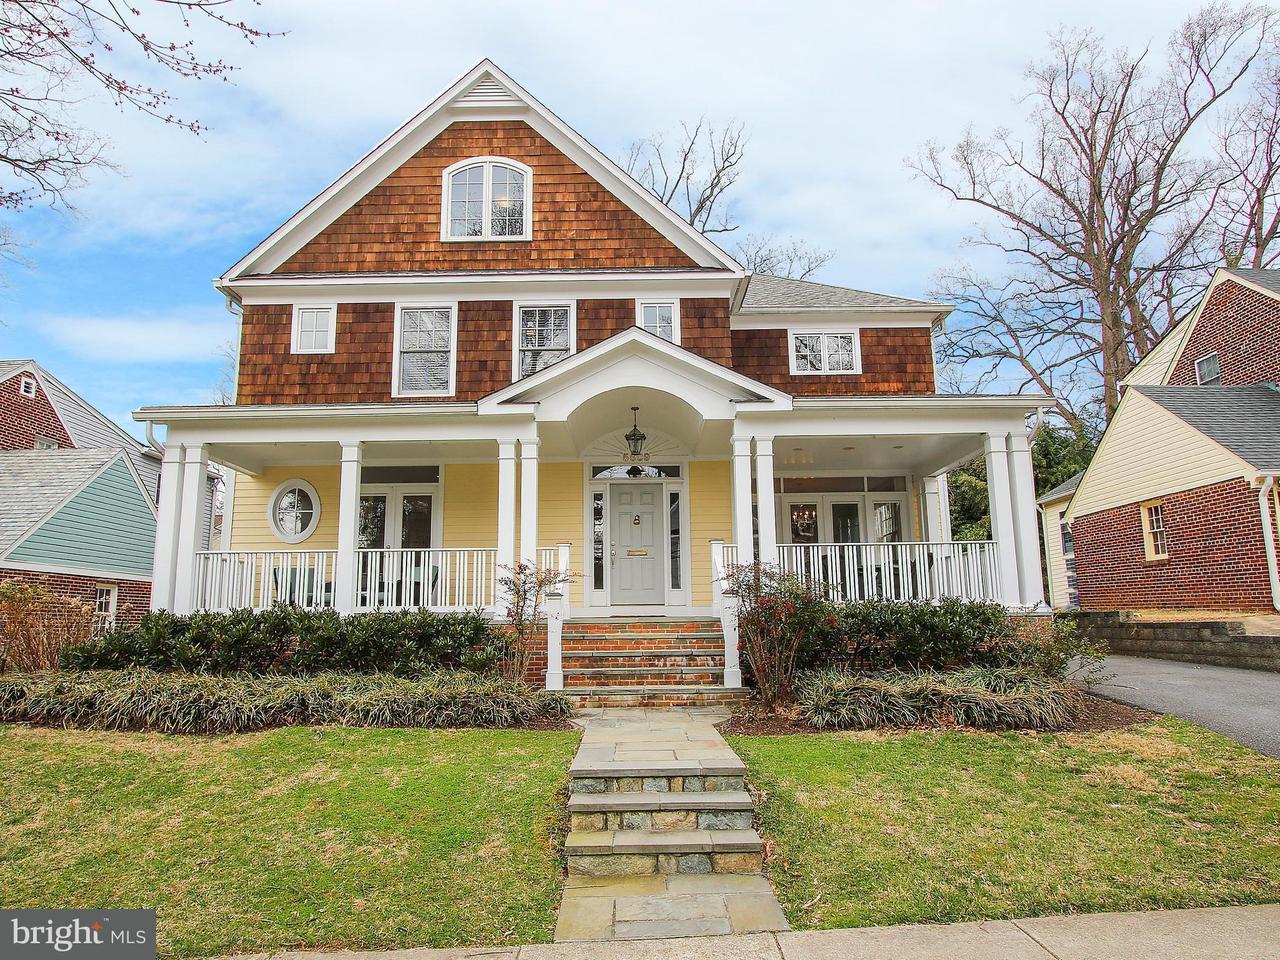 Single Family for Sale at 5609 Roosevelt St Bethesda, Maryland 20817 United States